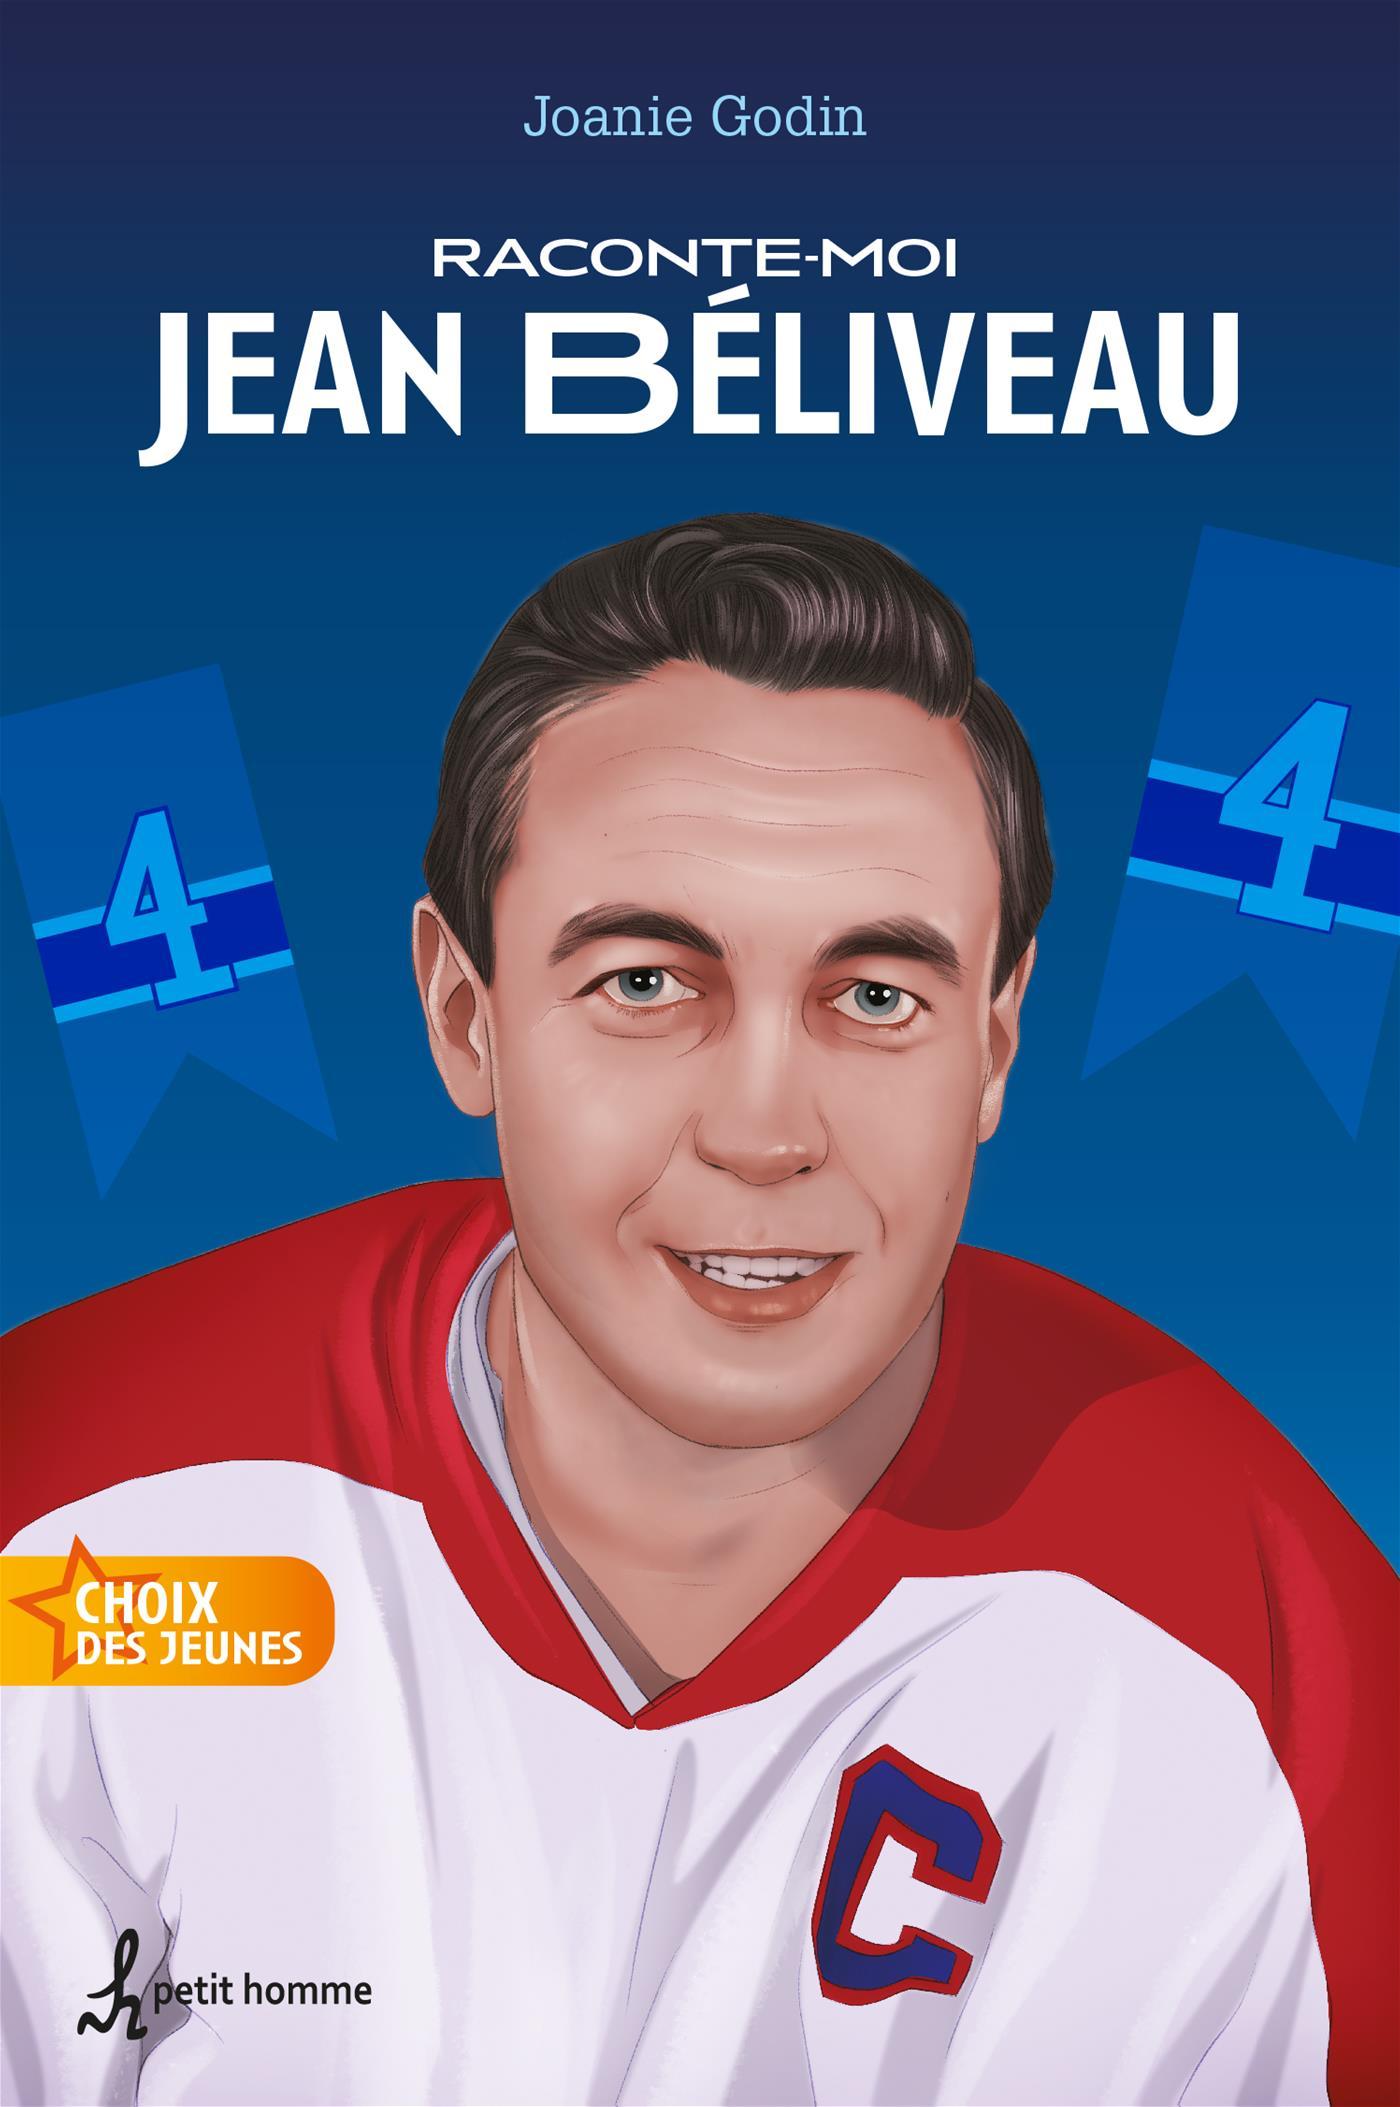 Raconte-moi Jean Béliveau